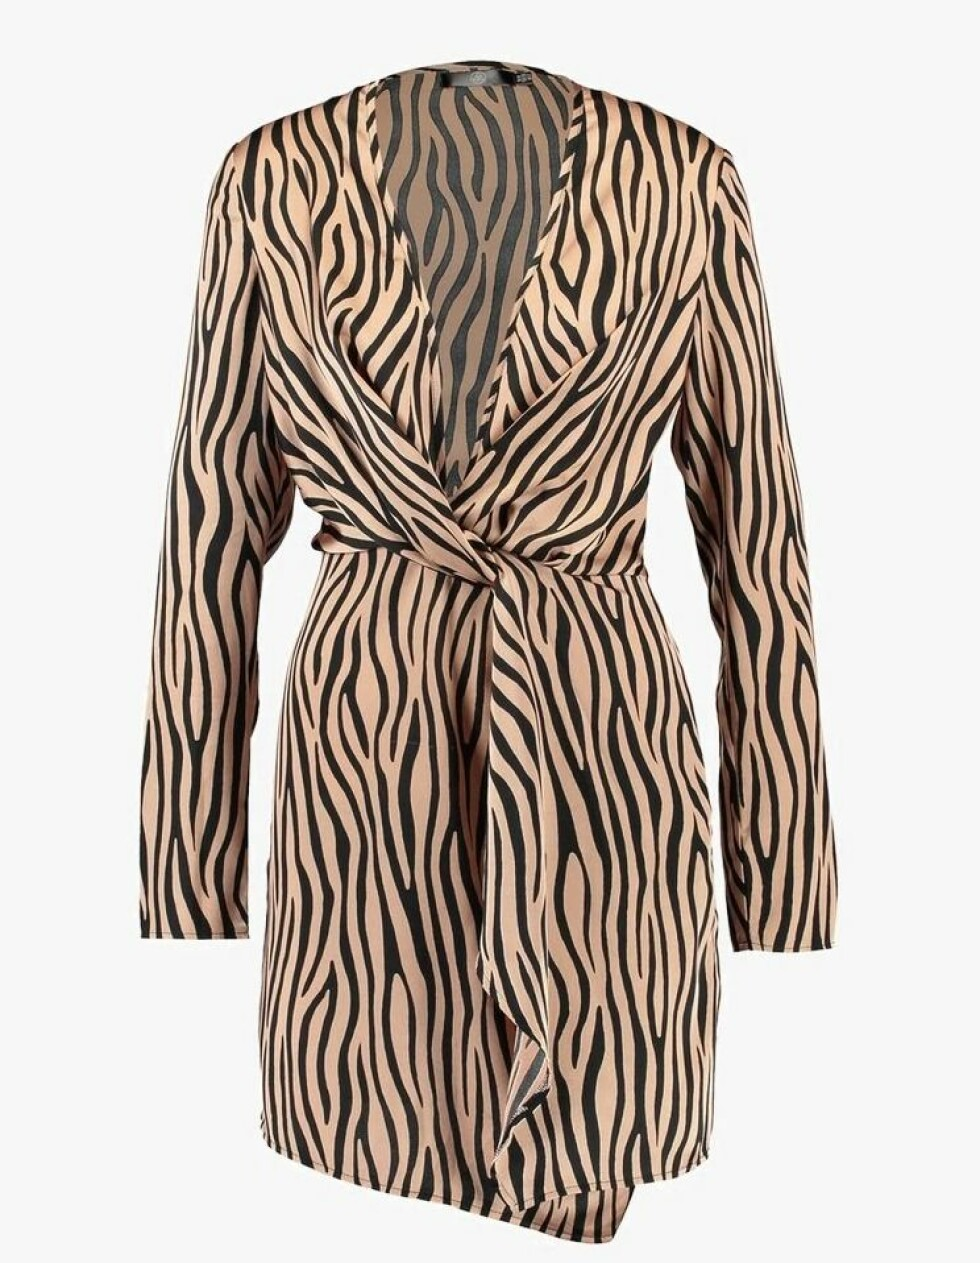 Kjole fra Missguided |399,-| https://www.zalando.no/missguided-kjole-brown-m0q21c12i-o11.html